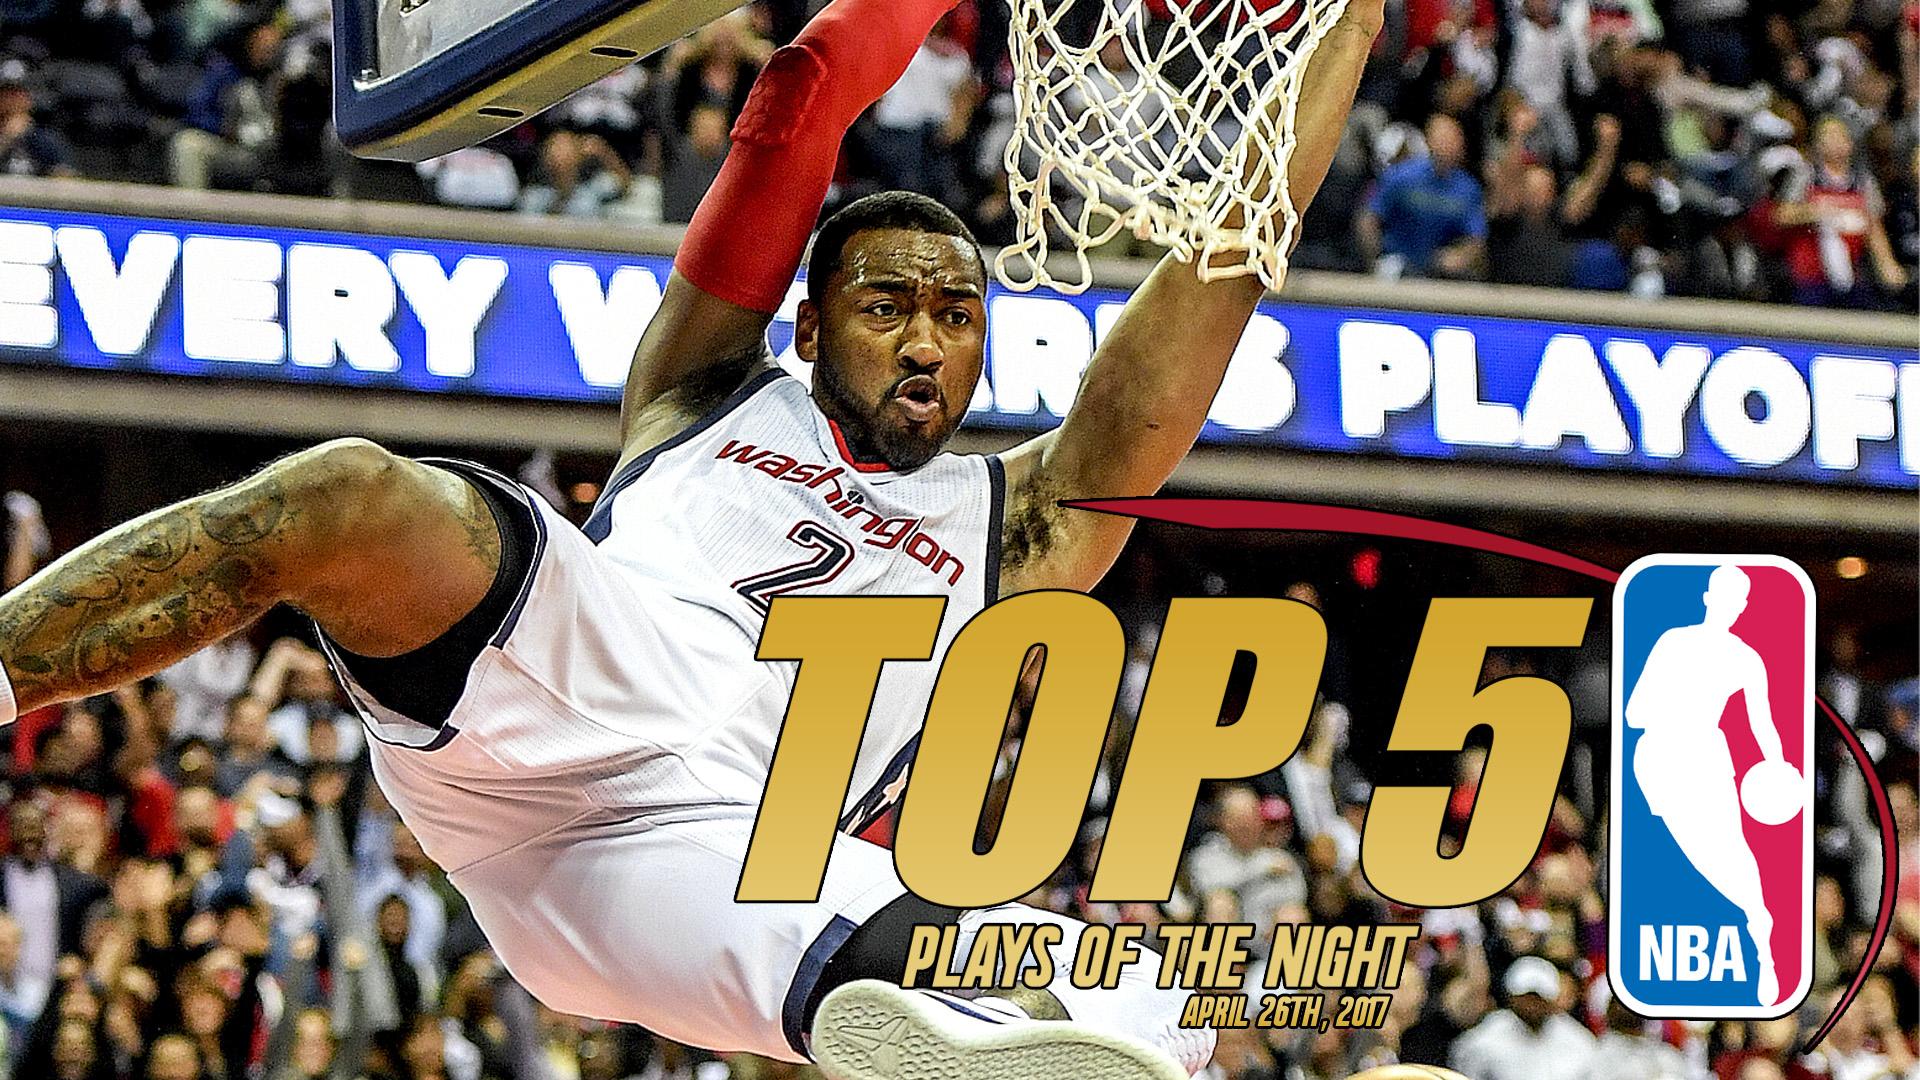 NBA Talk Top 5 Plays of the Night | April 26th, 2017